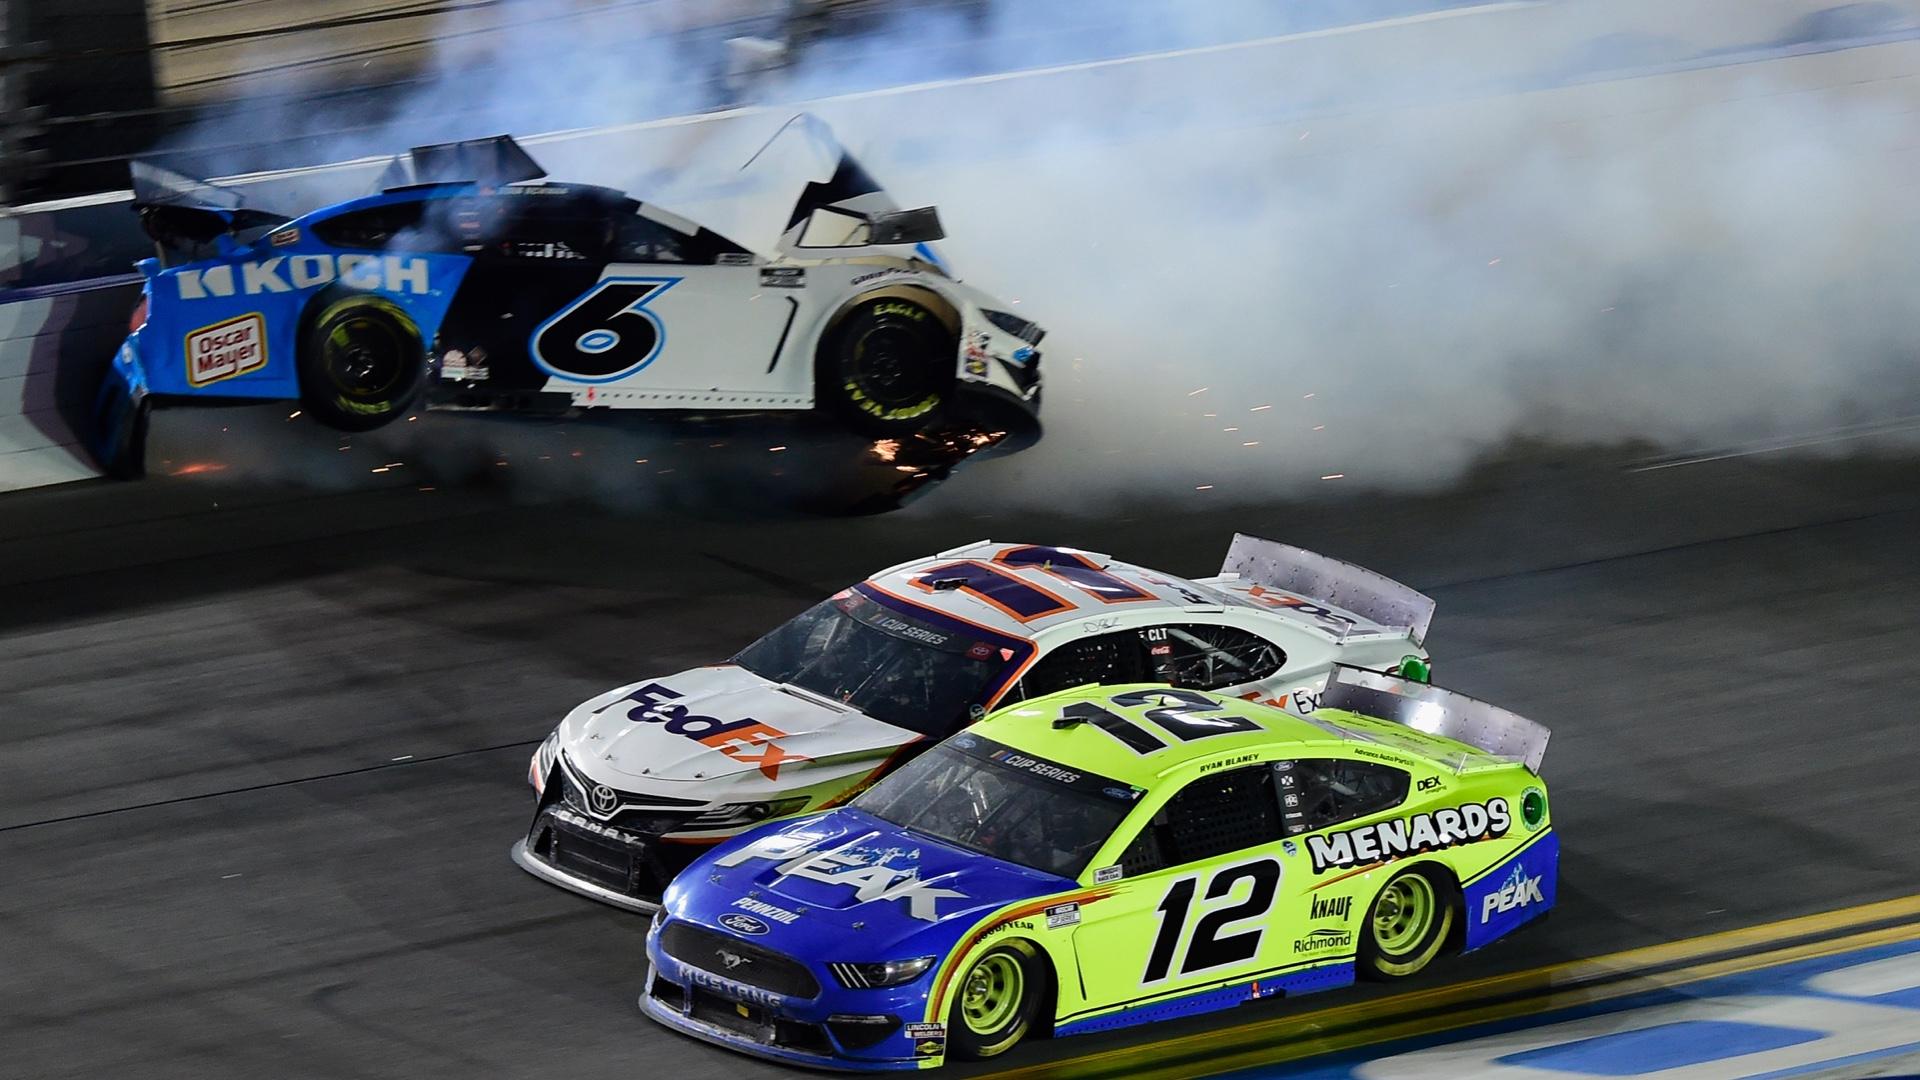 Photo of FS1 finally broadcasts Daytona 500 'Radioactive' with reactions to Ryan Newman's crash